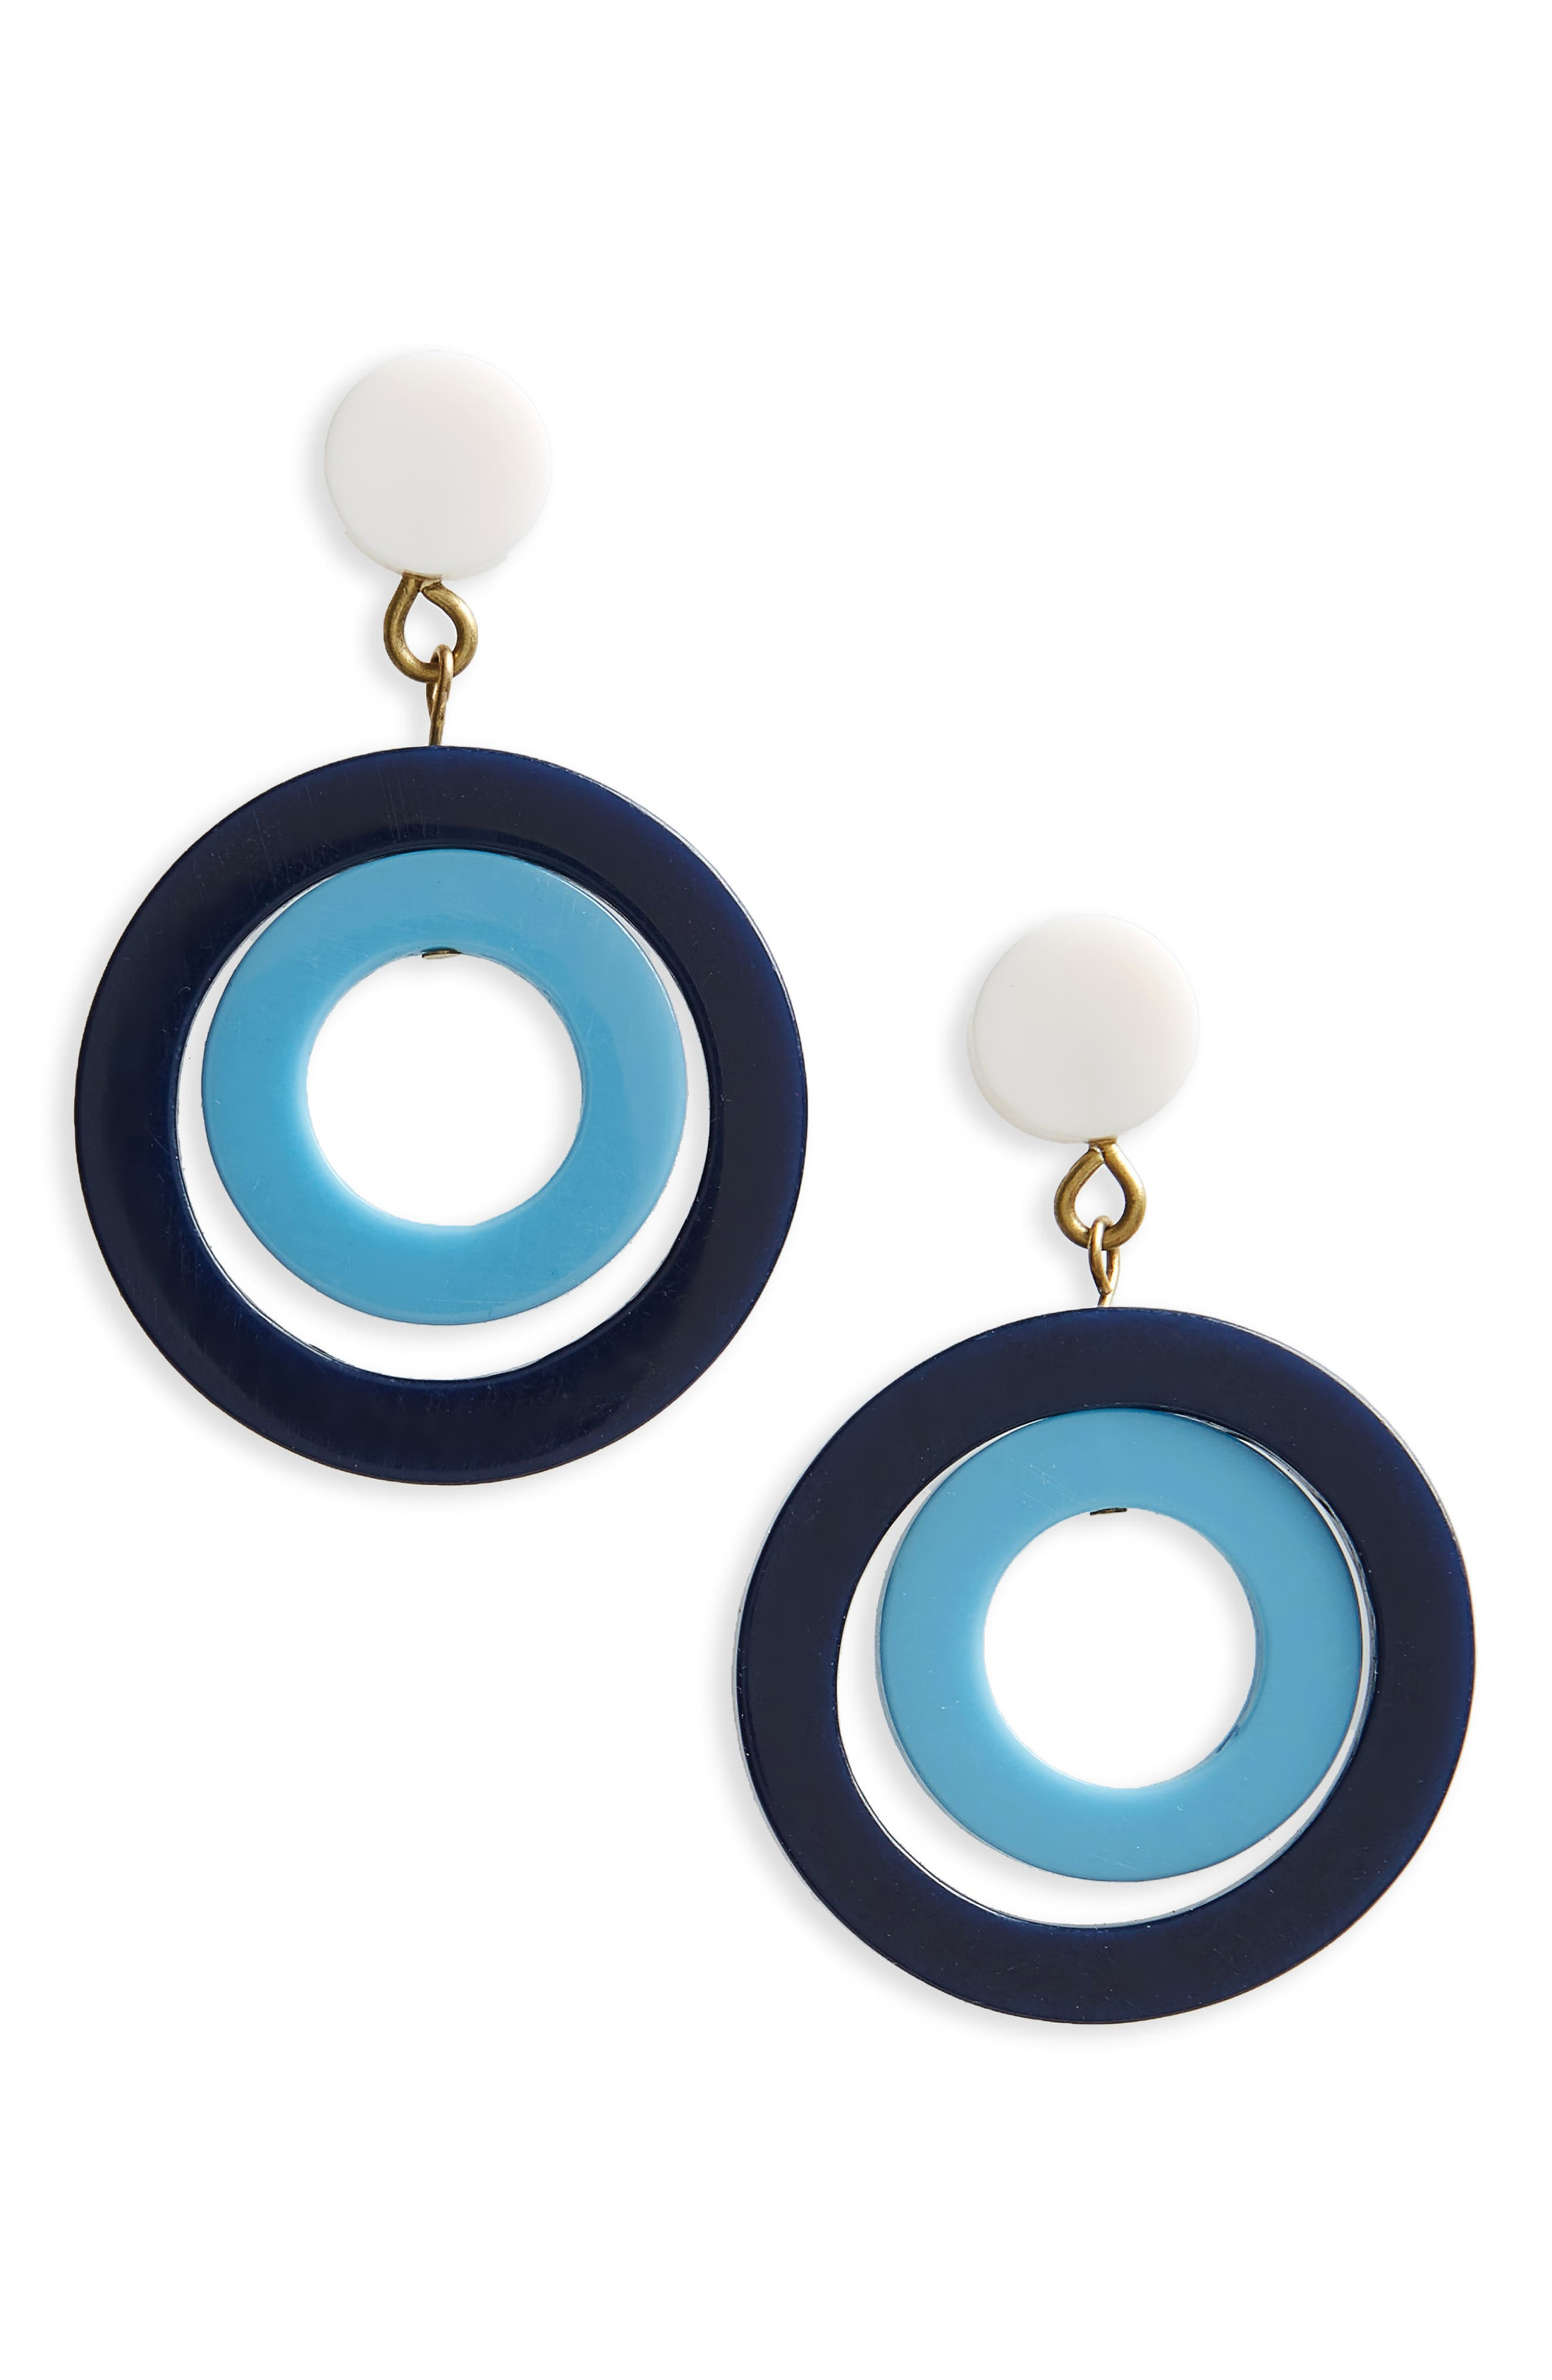 Huntington Earrings,                             Main thumbnail 1, color,                             Navy/ Turquoise